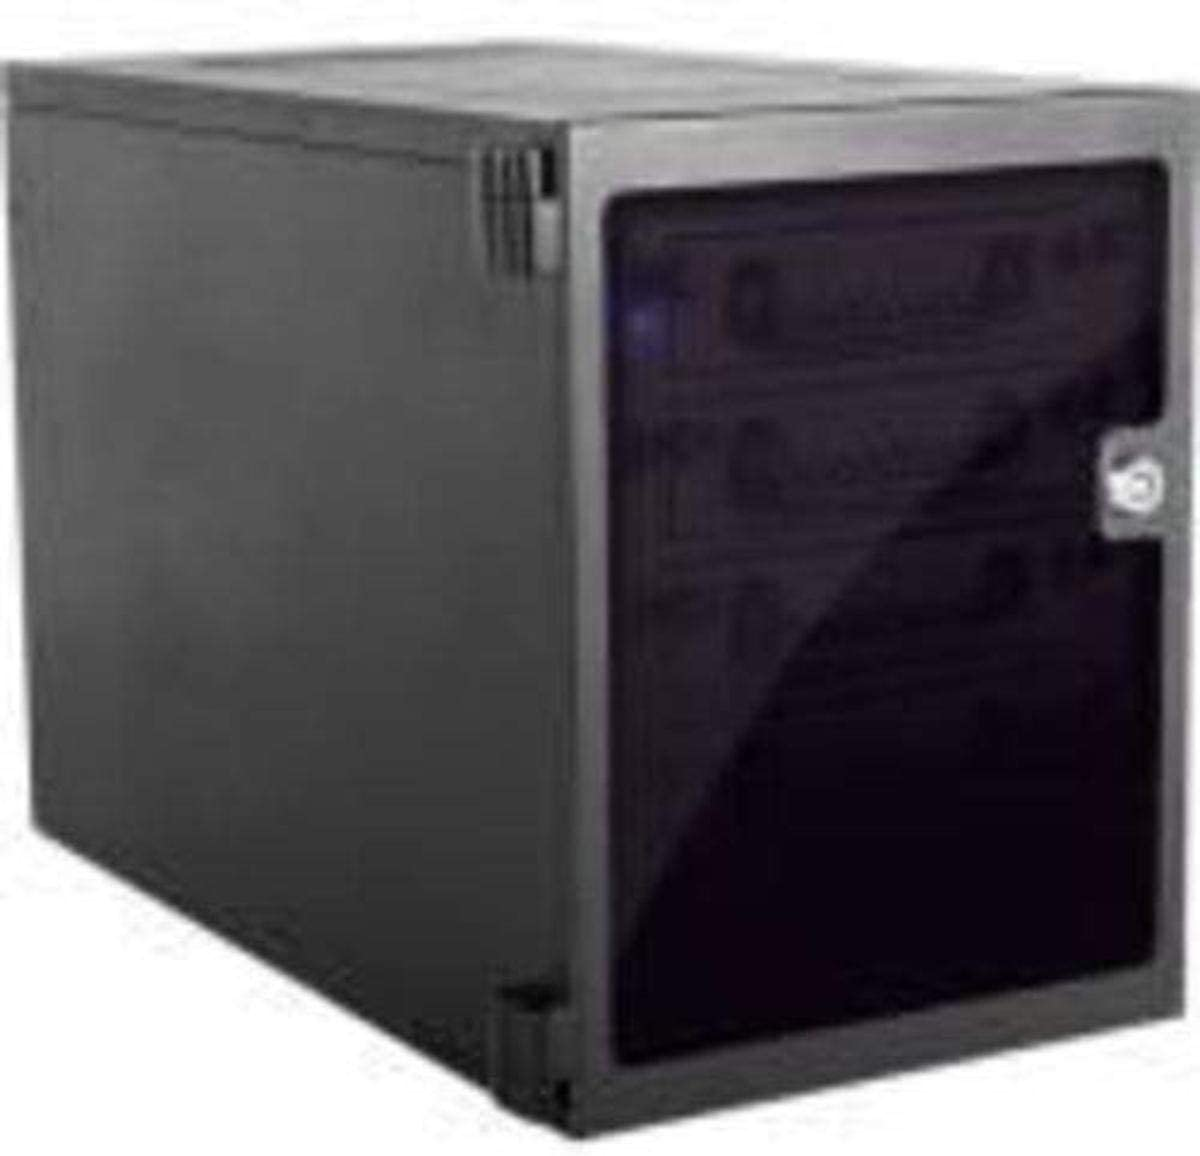 iStarUSA Storage Ranking TOP13 EAGE540TG-SAU3 5Bay eSATA Hot-Swap Mesa Mall 3.5inch USB3